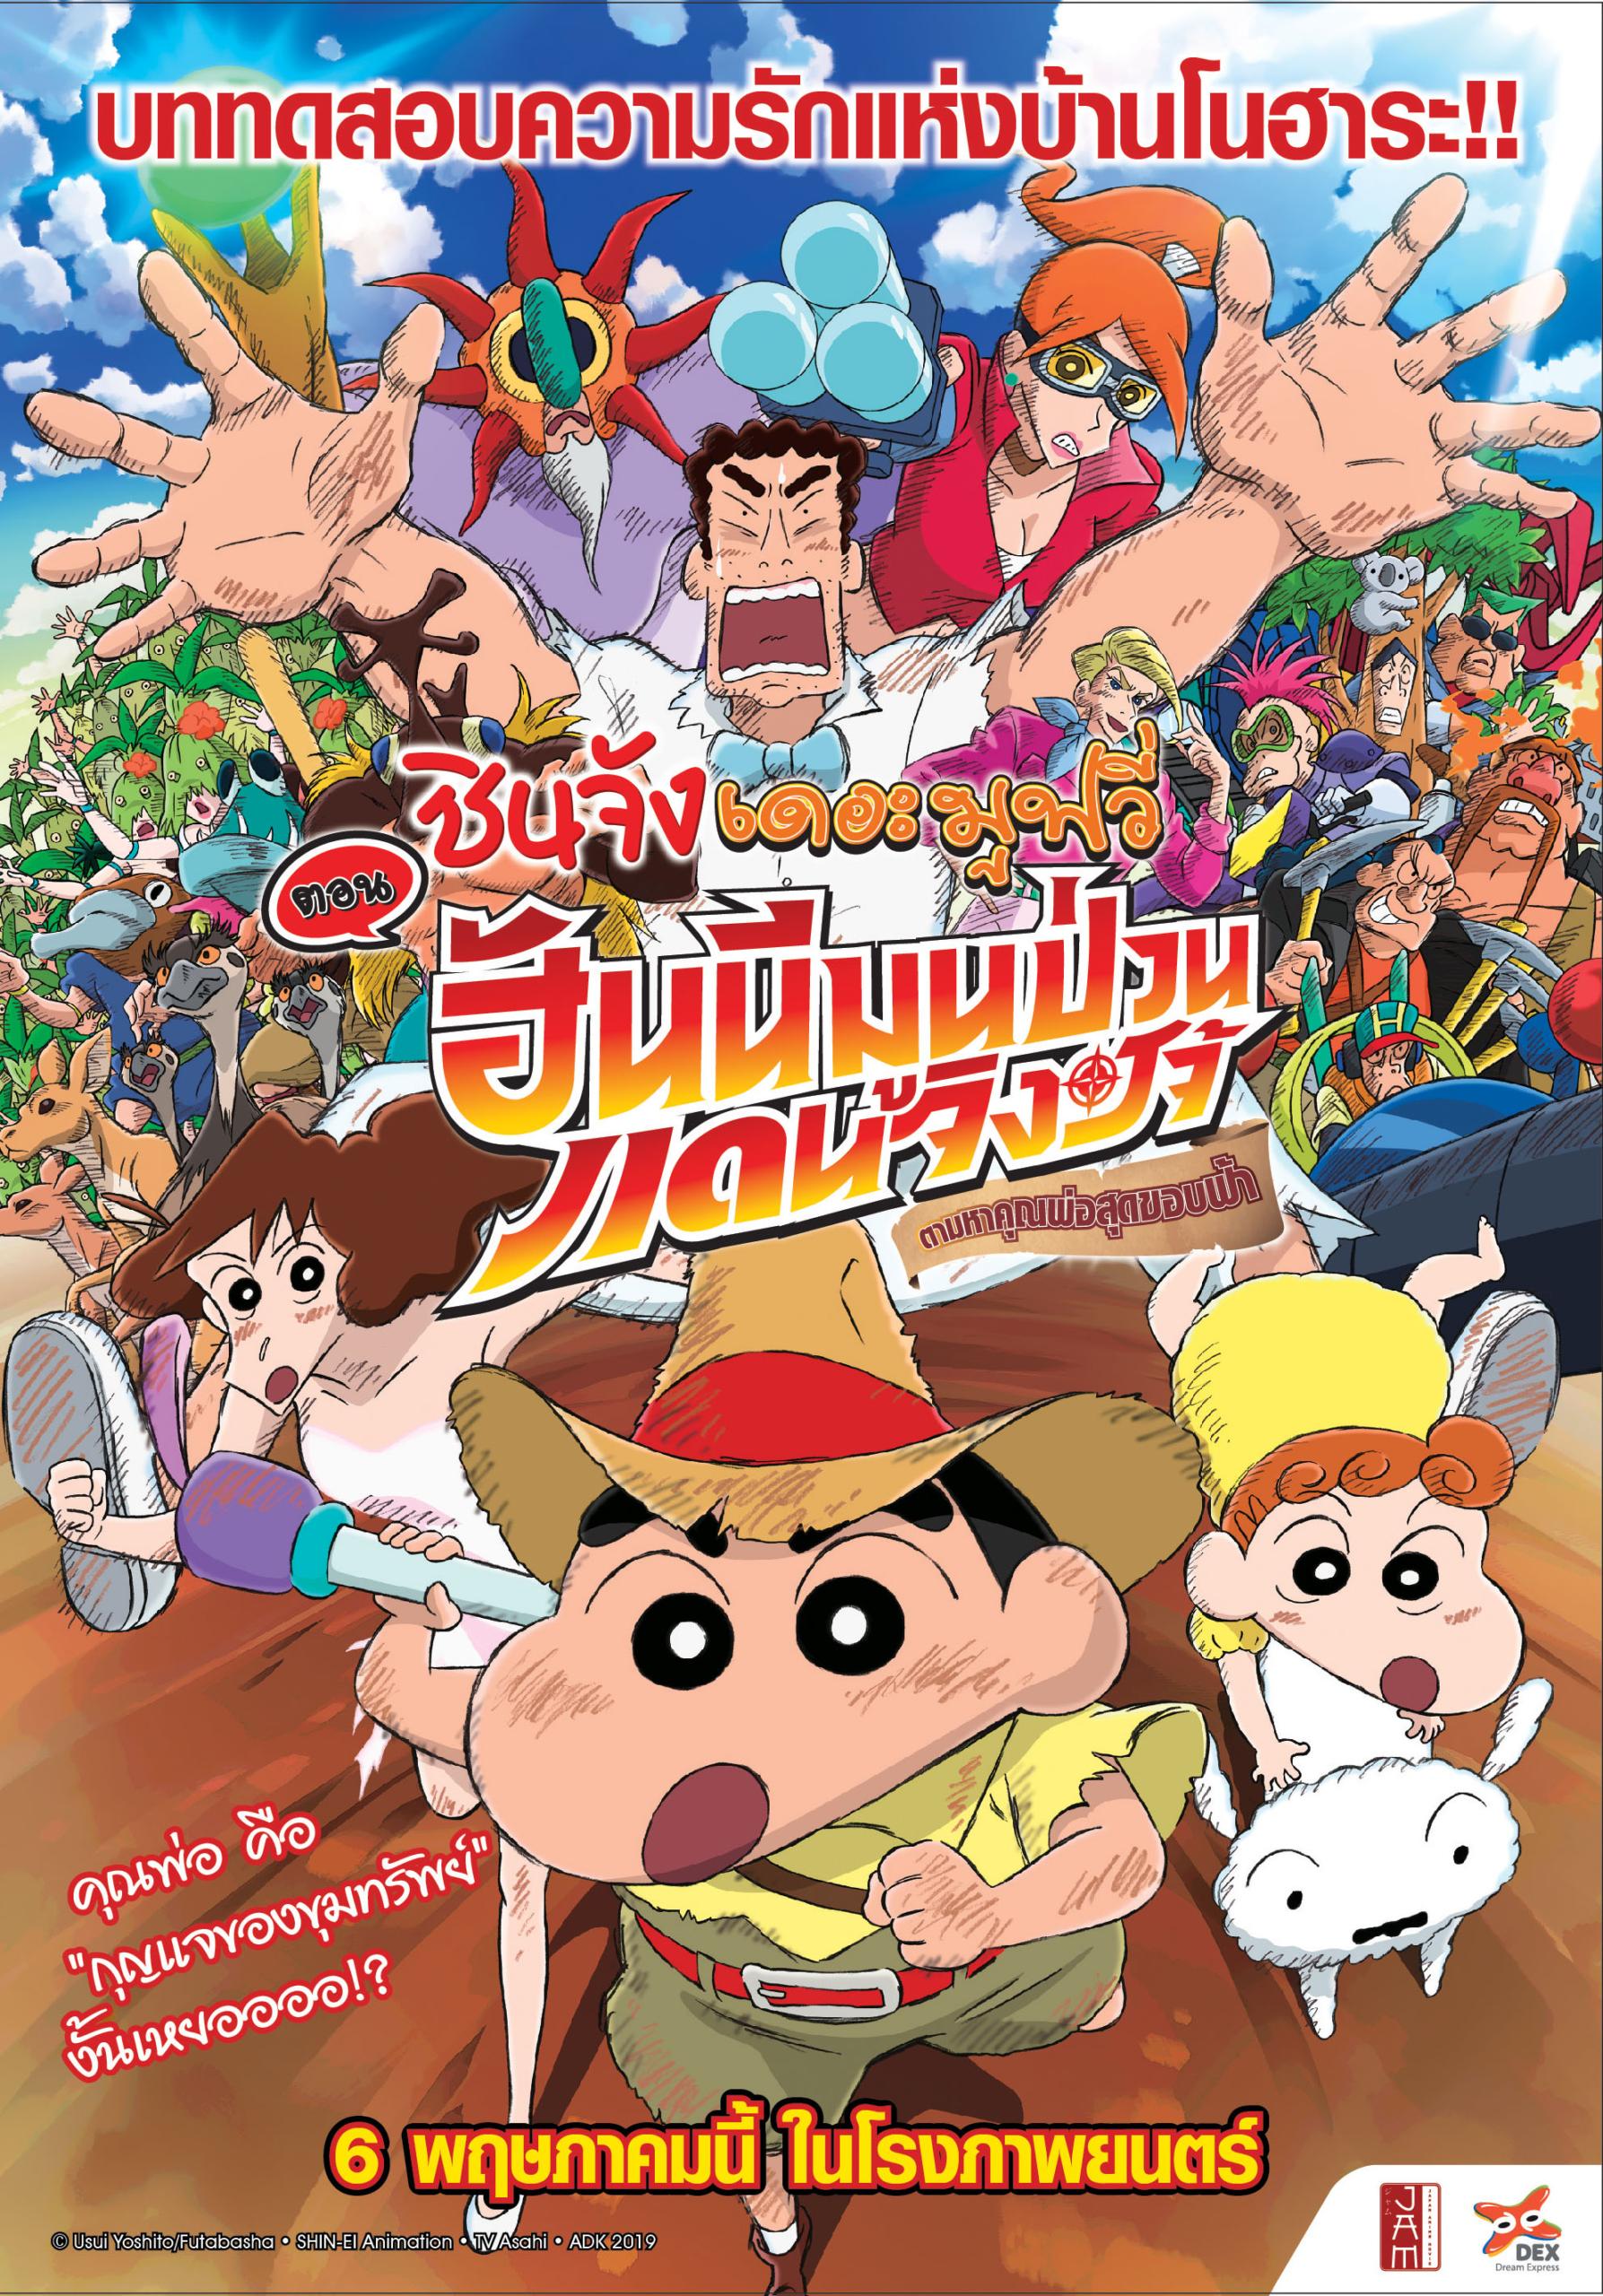 Crayon Shin-chan: Honeymoon Hurricane – The Lost Hiroshi (2019) ชินจัง เดอะมูฟวี่ ตอน ฮันนีมูนป่วนแดนจิงโจ้ ตามหาคุณพ่อสุดขอบฟ้า